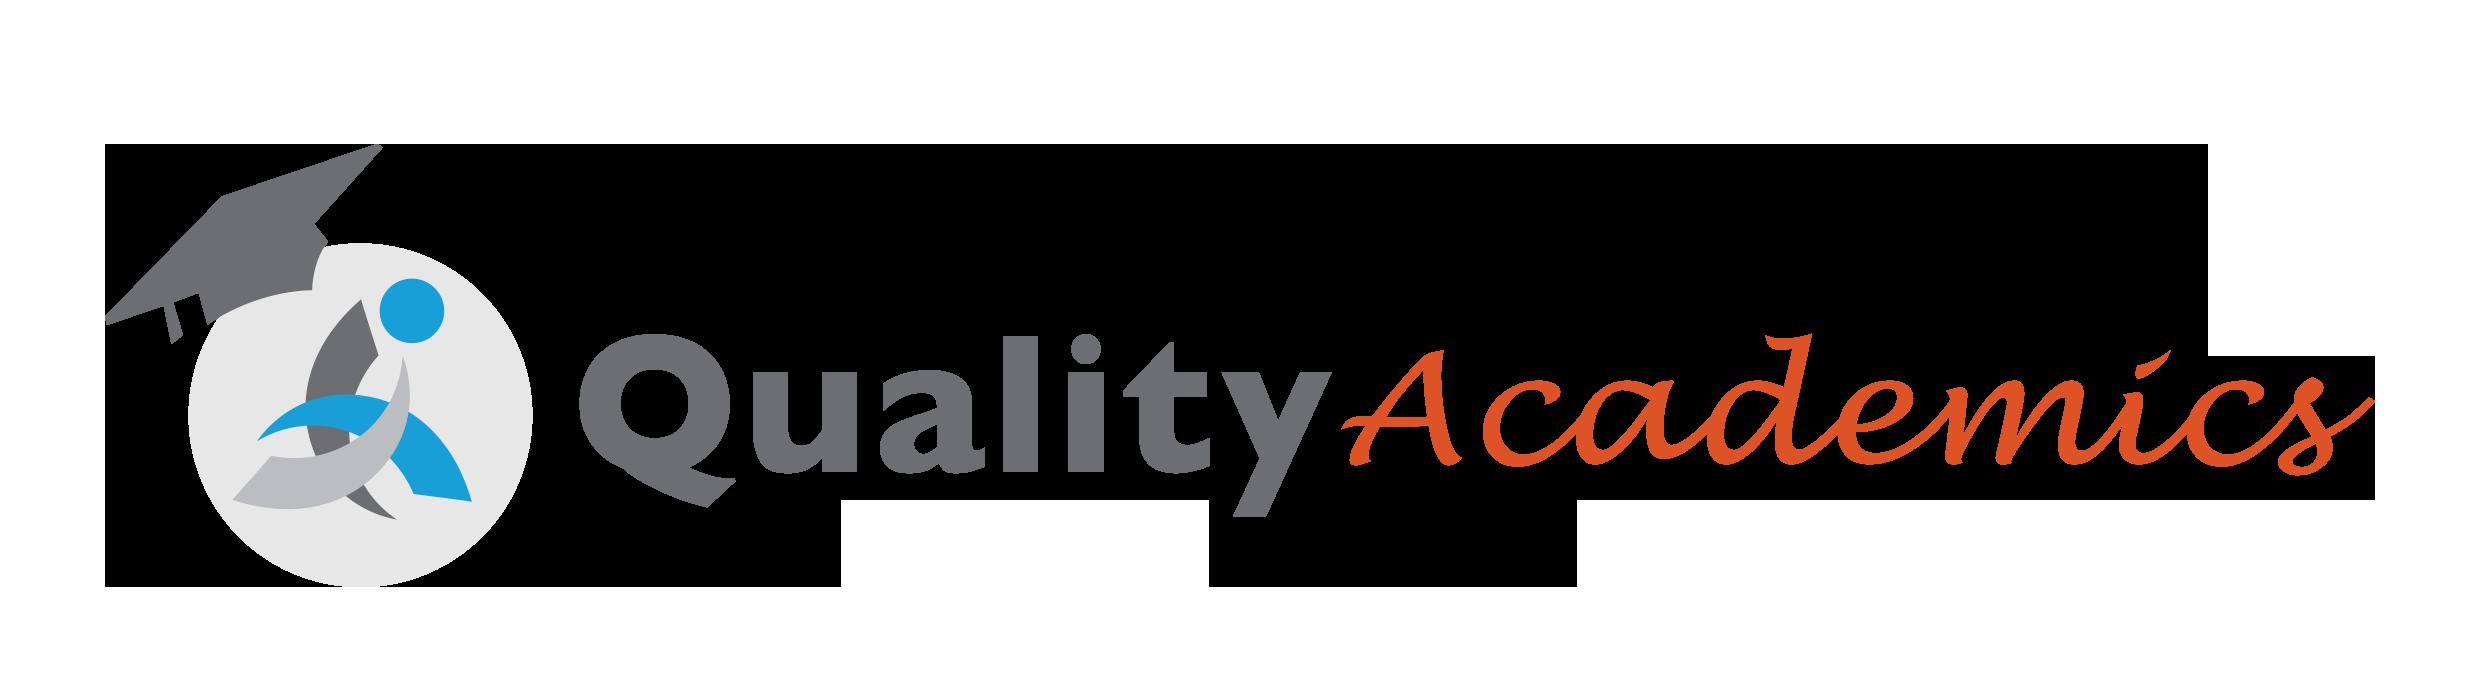 Quality Academics